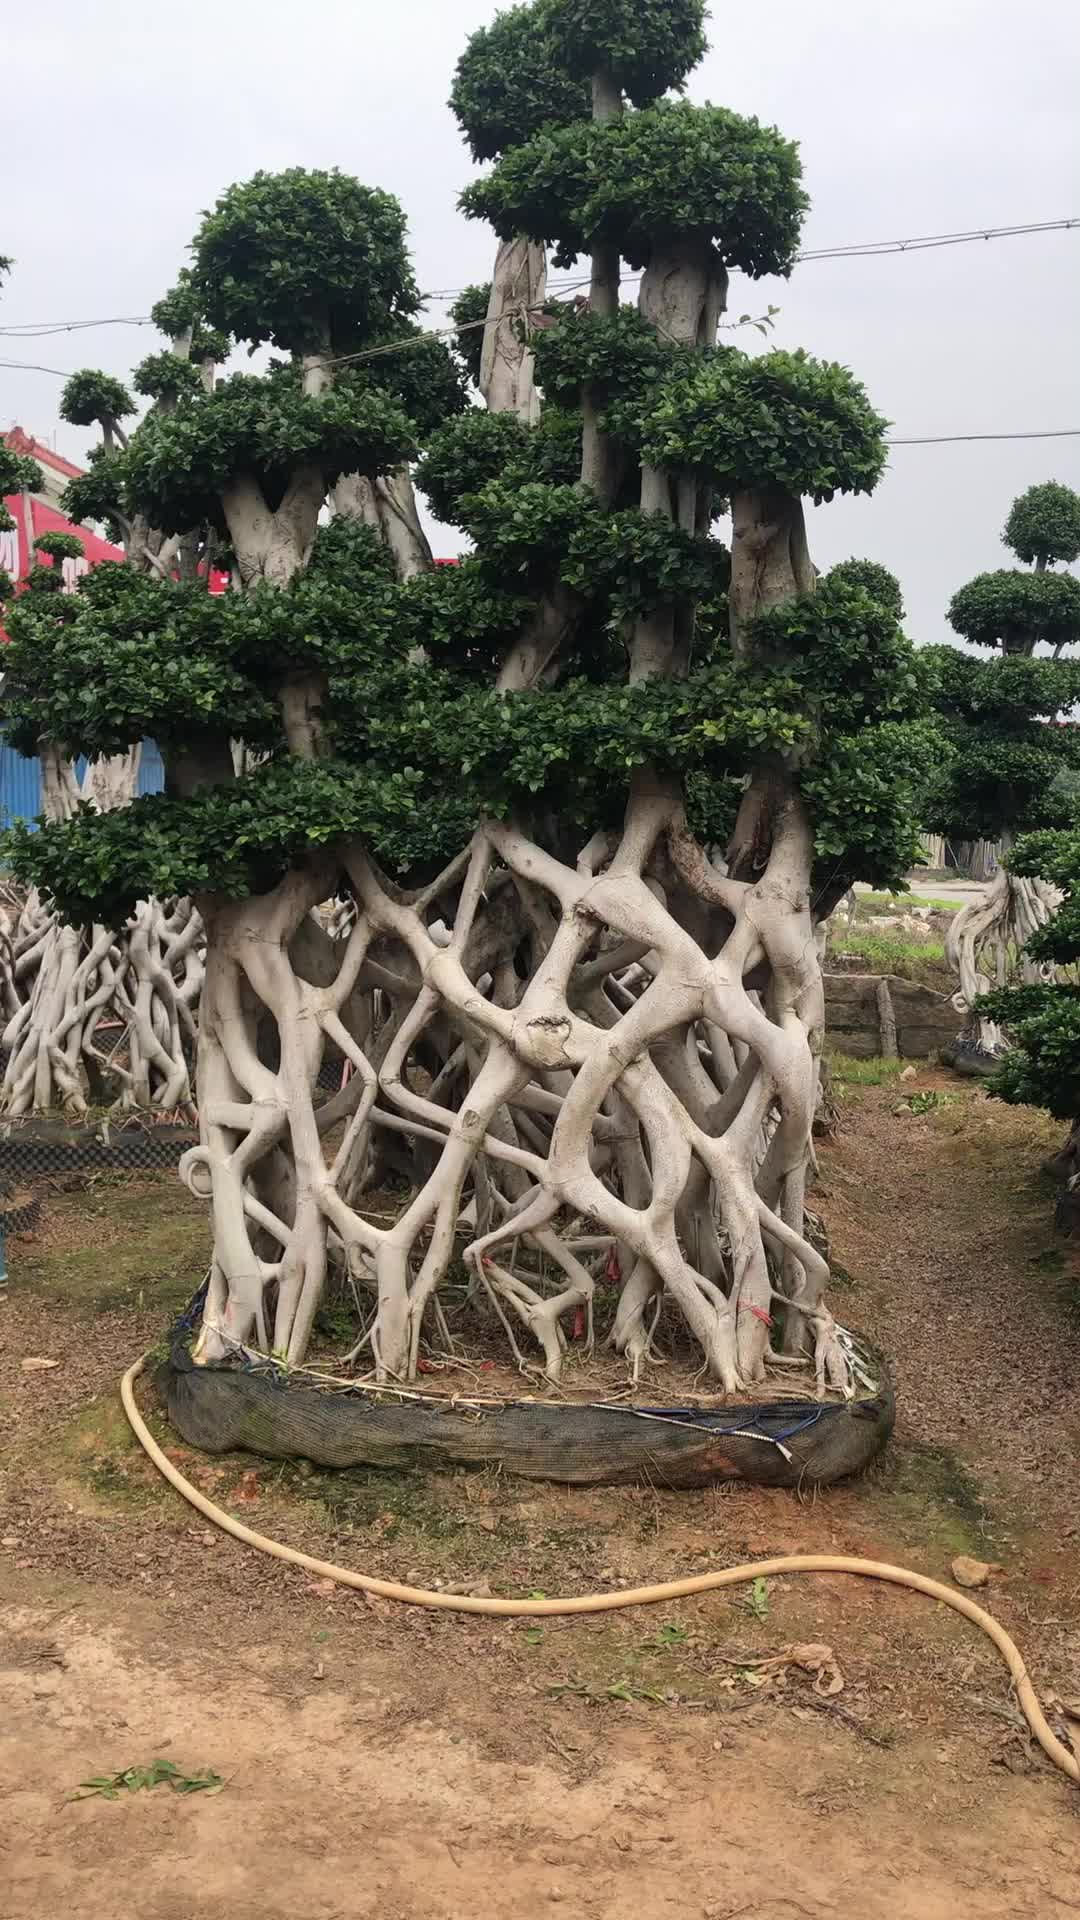 Großhandel live natürliche große oder große ficus microcarpa baum bonsai pflanzen outdoor indoor landschaft oramental dekoration kindergarten oder